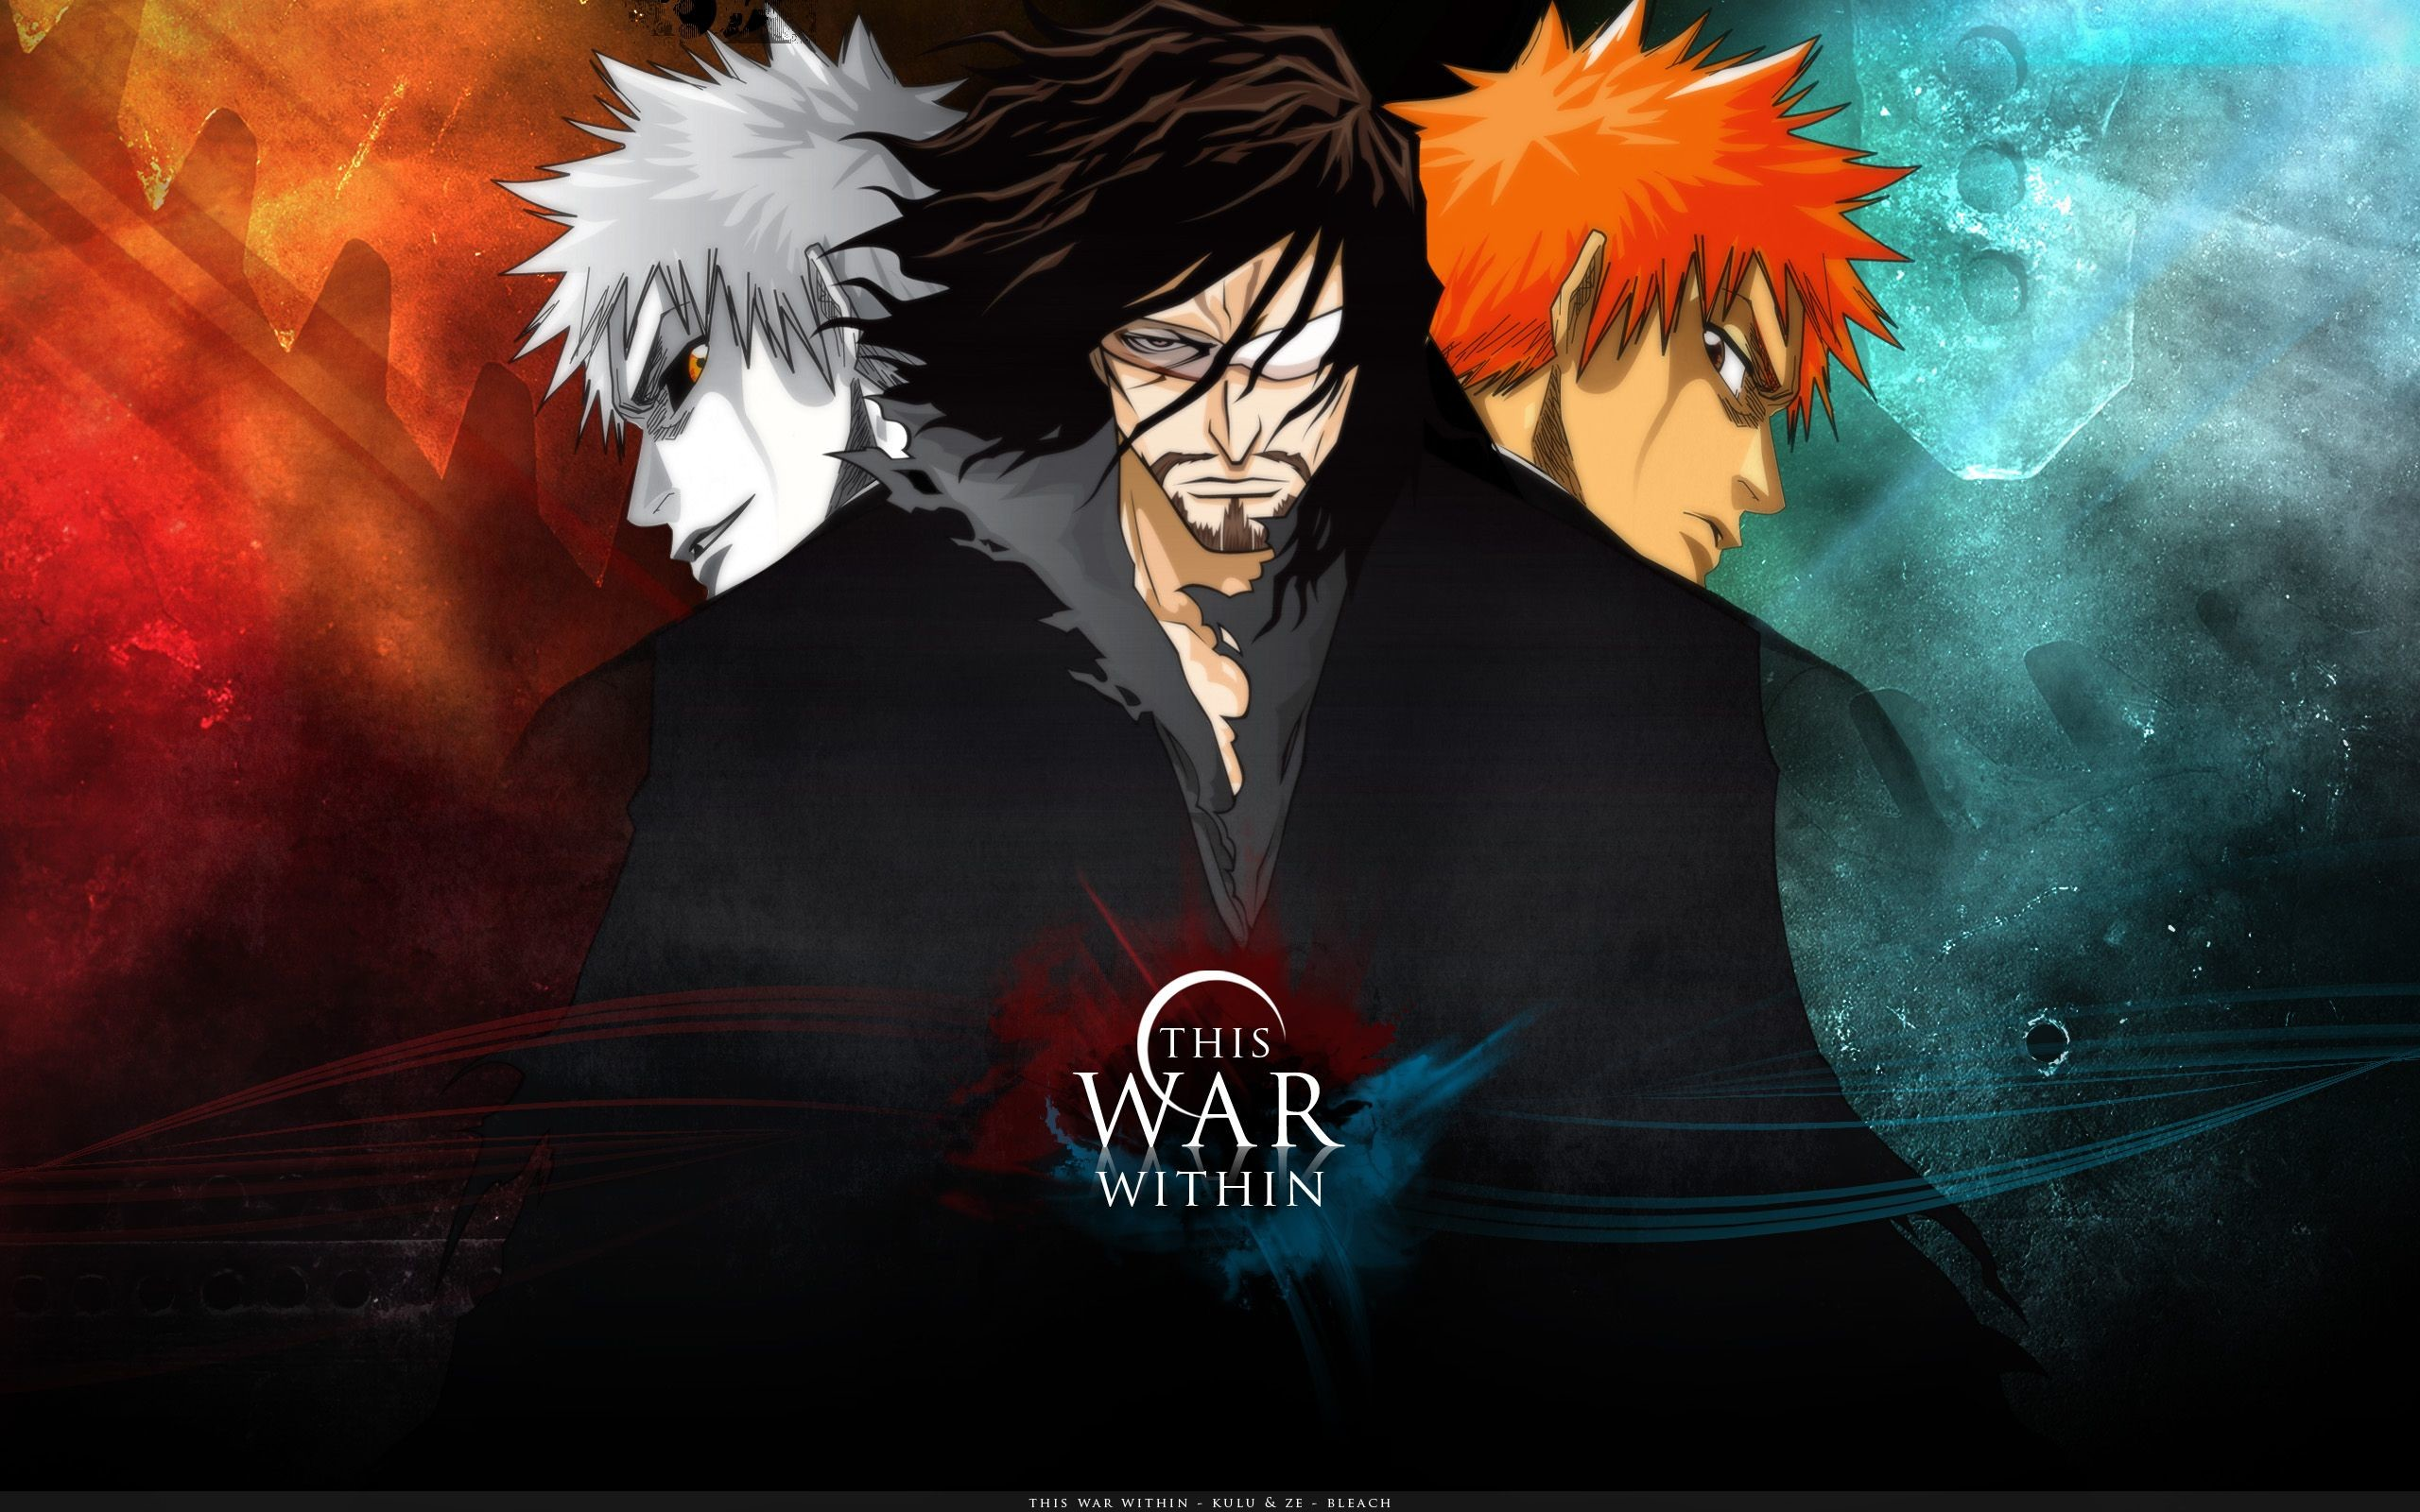 Anime wallpaper 2018 86 images - Anime computer wallpaper ...